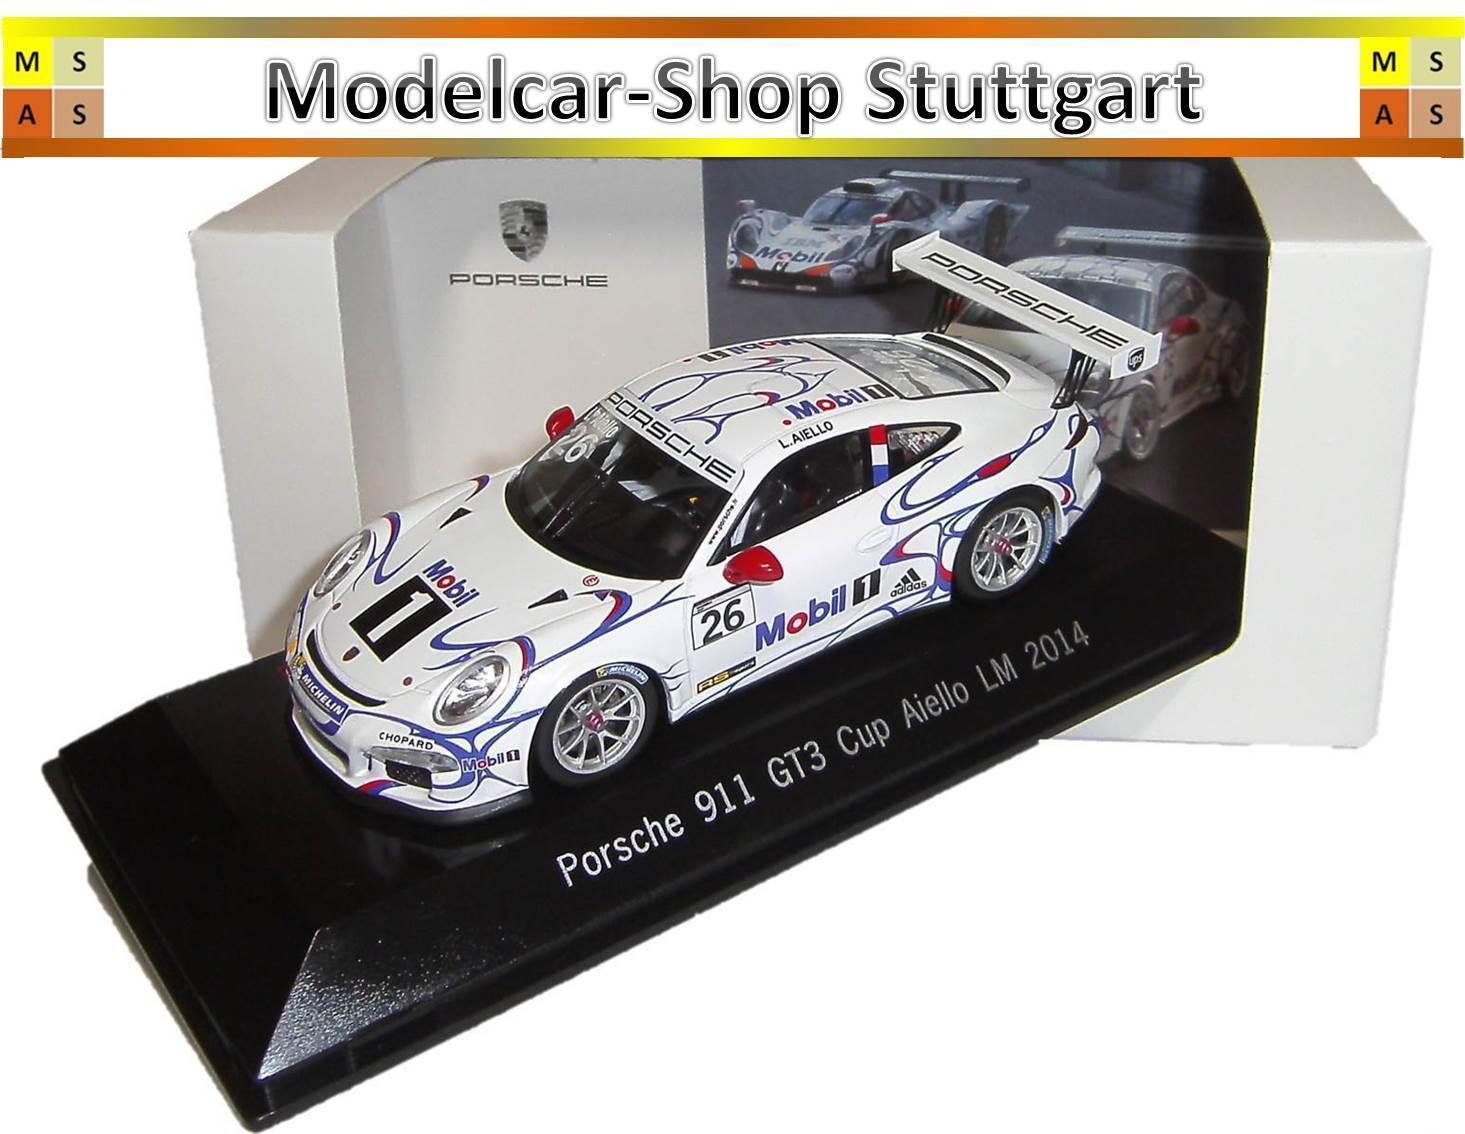 Porsche 911 GT3 Cup Aiello Le Mans 2014 - Spark 1 43 - map02099214 - NEW